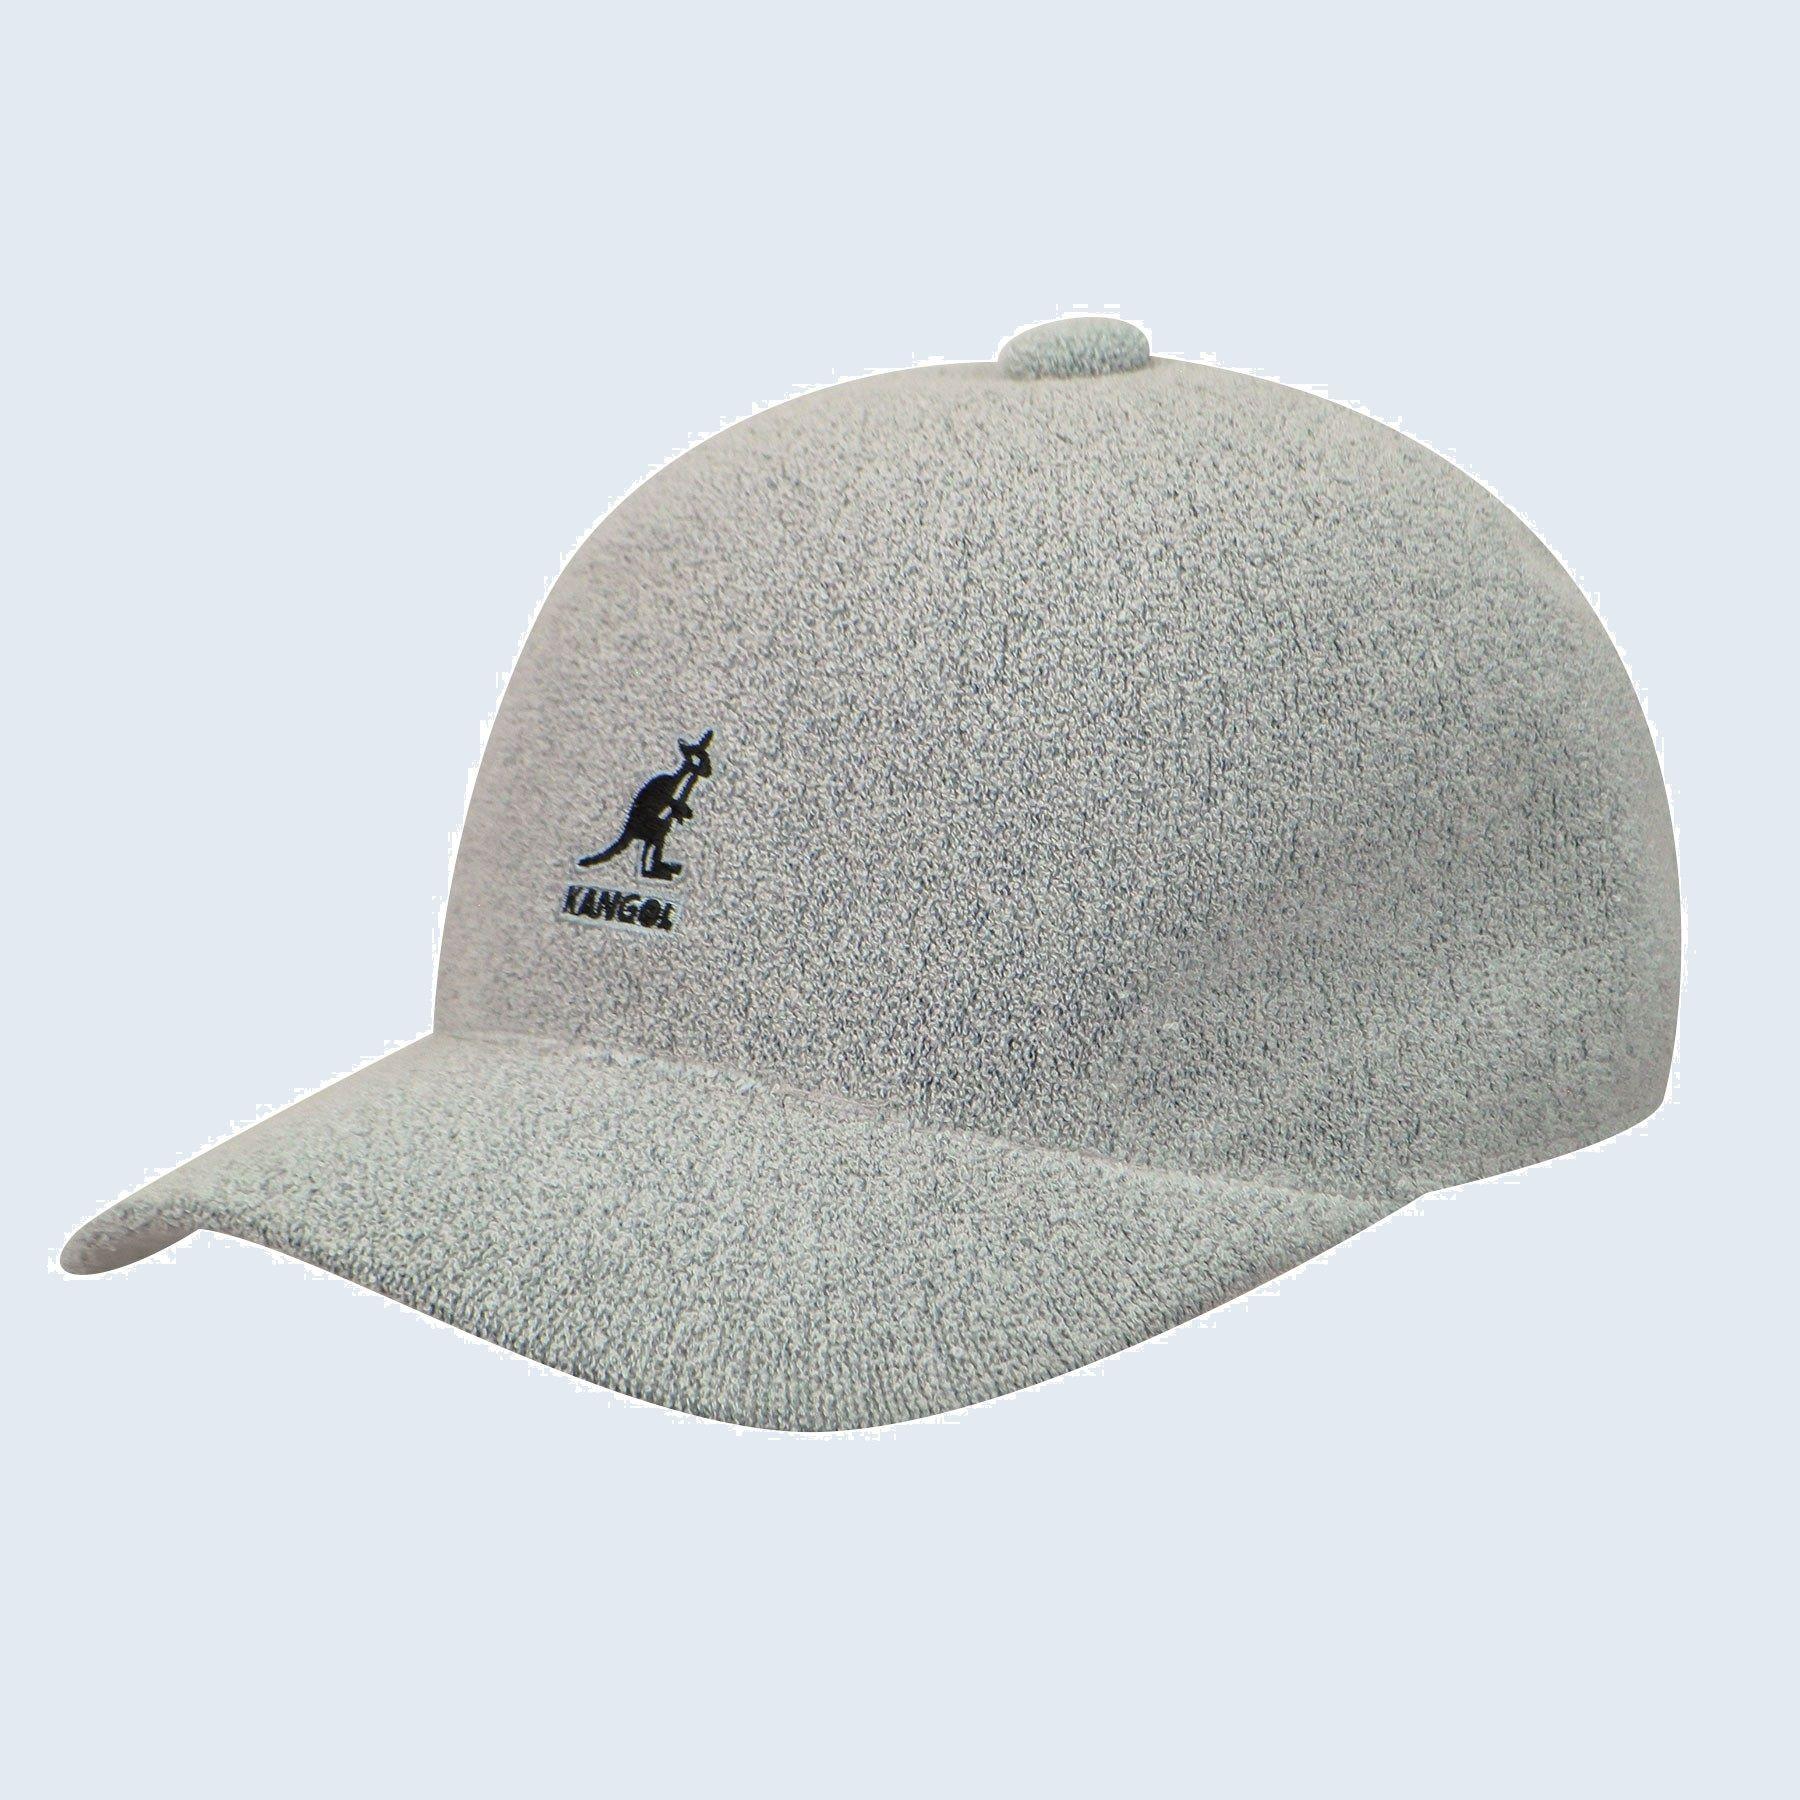 e23182ec04380b KANGOL-Street-Bermuda-Spacecap | Stuff to buy | Hats, Baseball hats ...